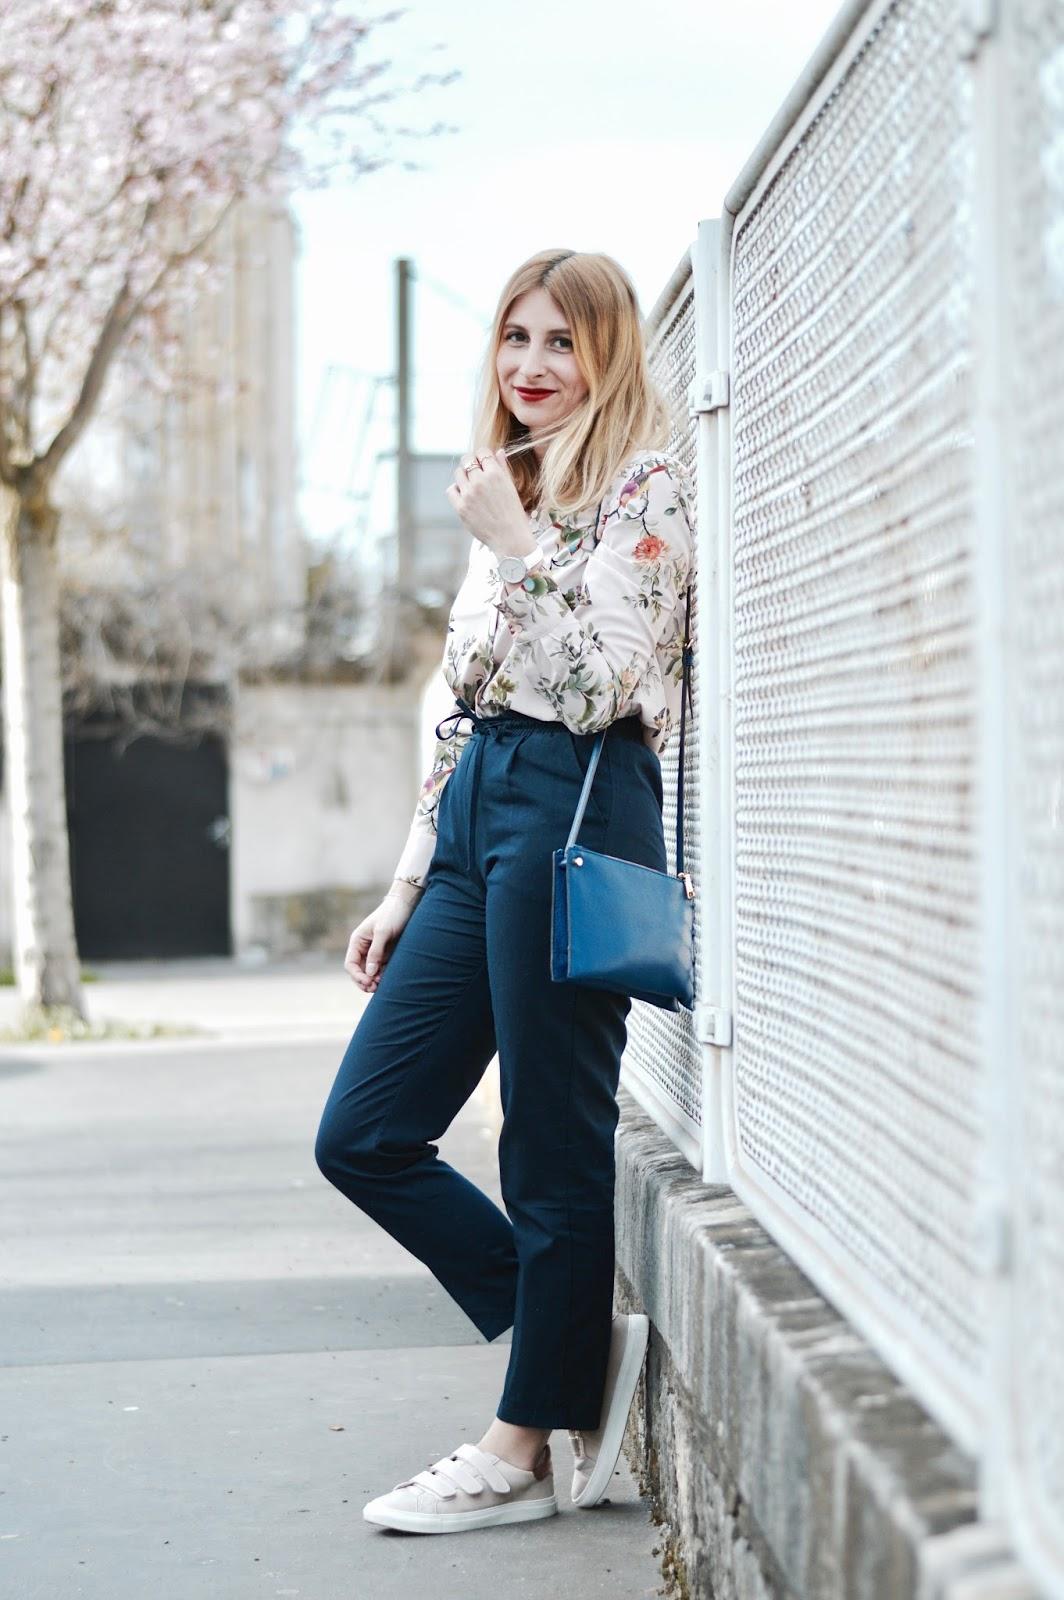 look femme printemps : veste rose et chemisier fleuri